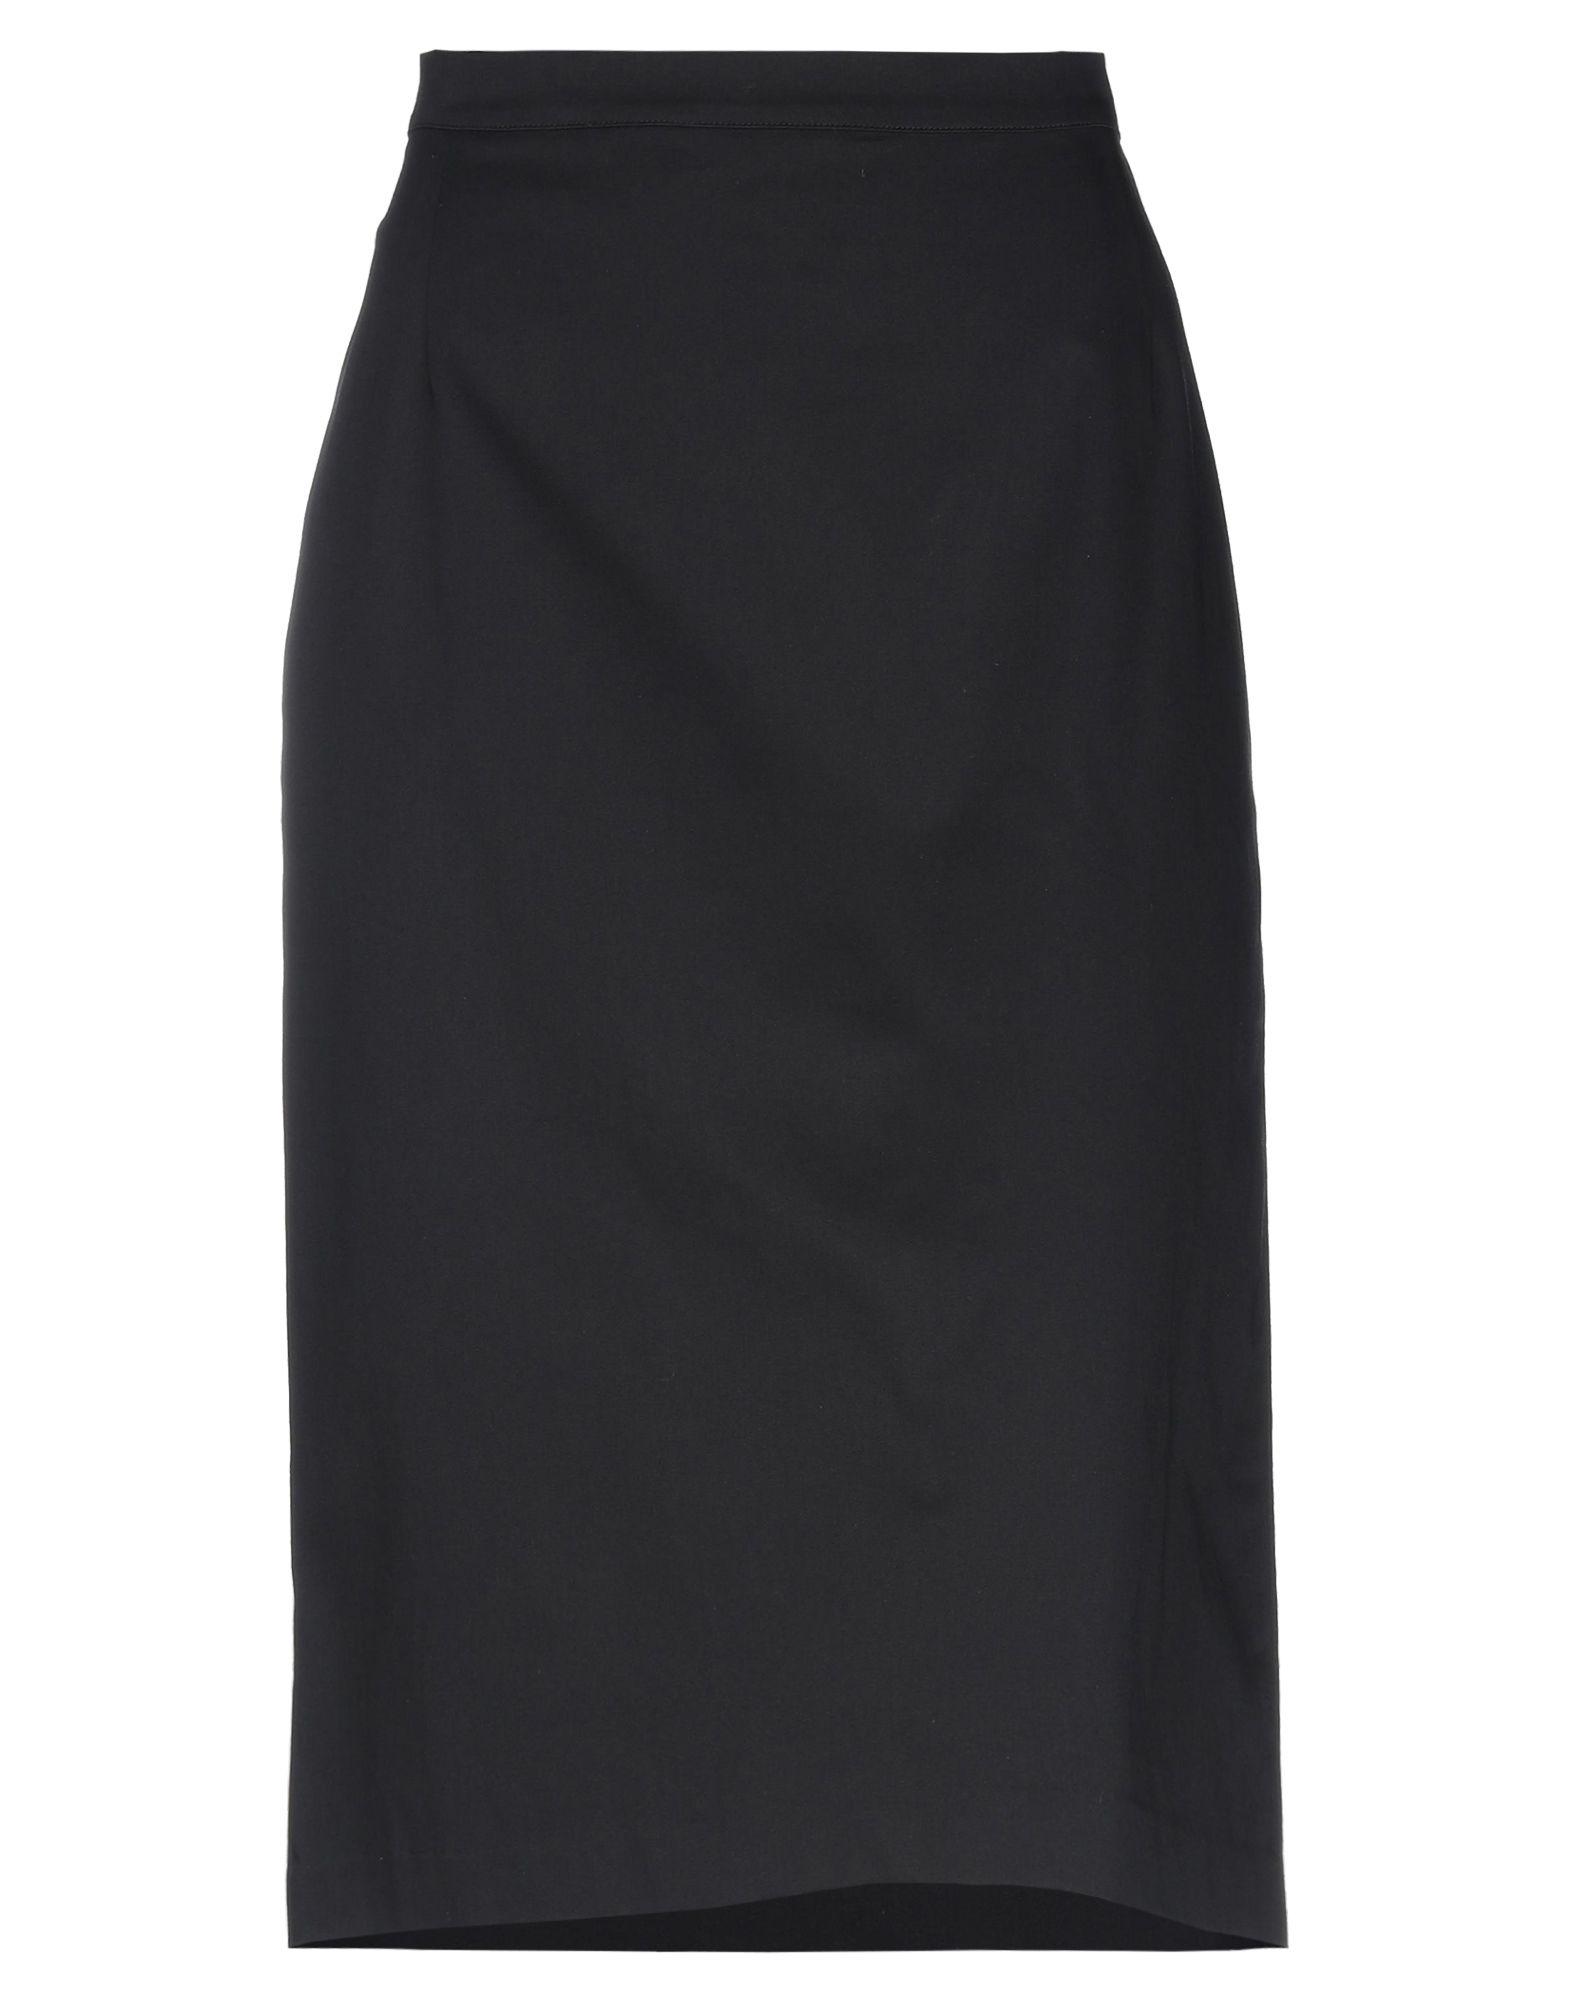 ELSA Z MON AMOUR Юбка длиной 3/4 z юбка z для девочки